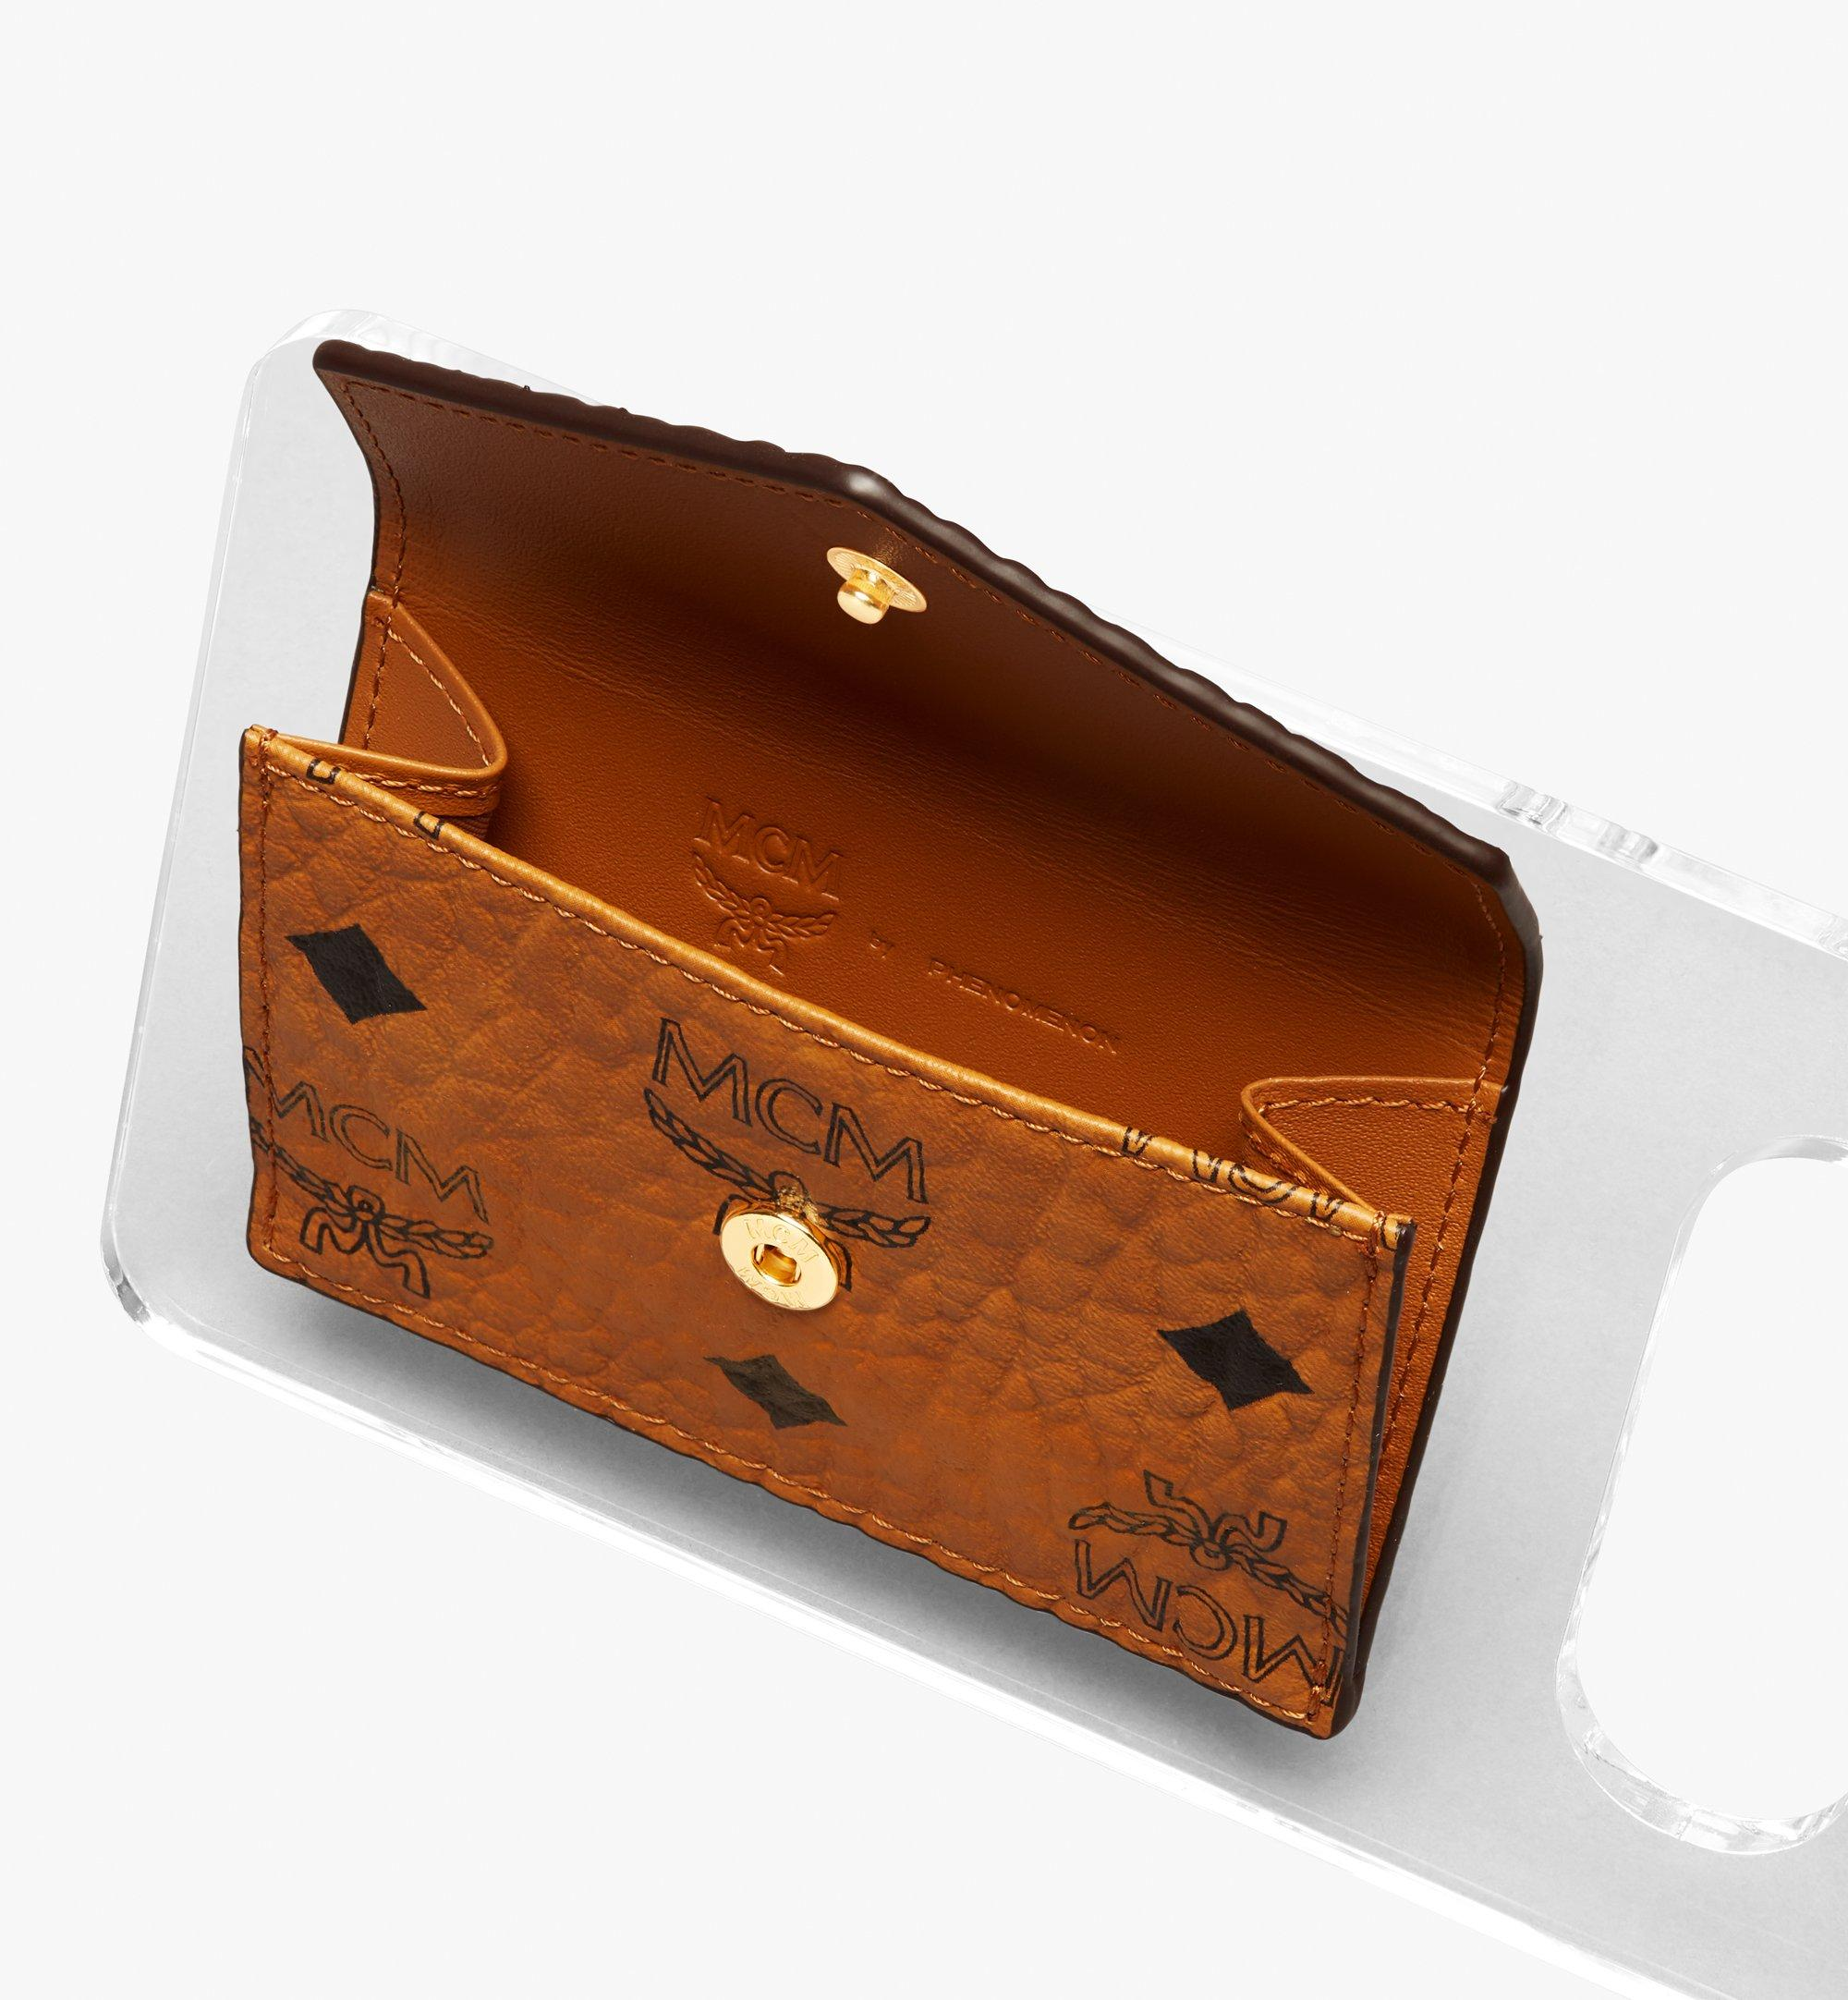 MCM MCM x PHENOMENON Mini-Portemonnaie in Visetos mit Acrylrahmen  MYAASJP02CO001 Noch mehr sehen 1